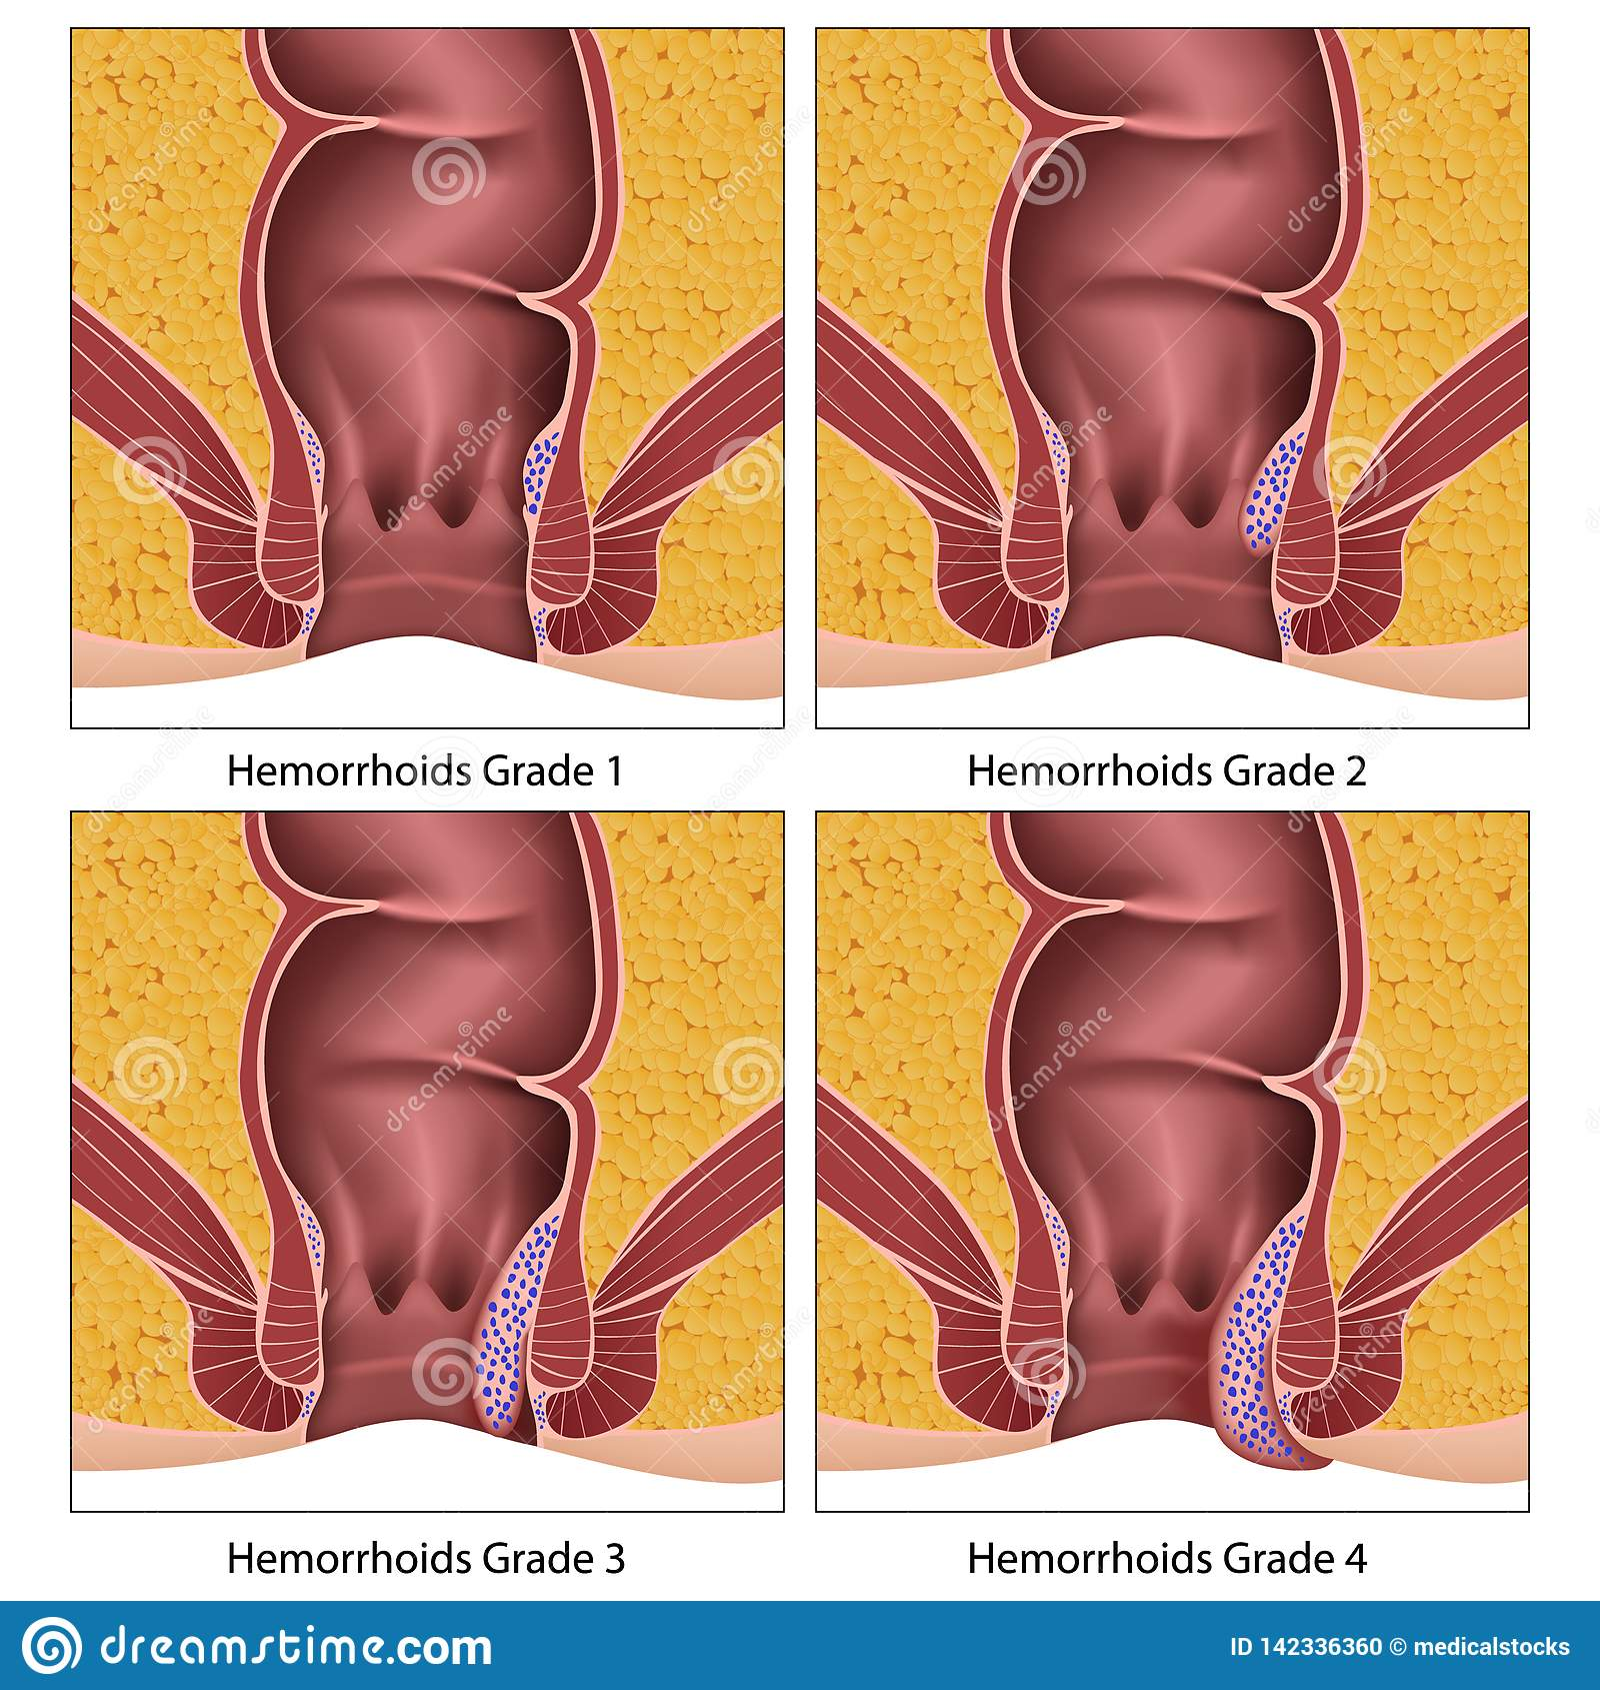 Hemorrhoids grade anatomy education info graphic on white background